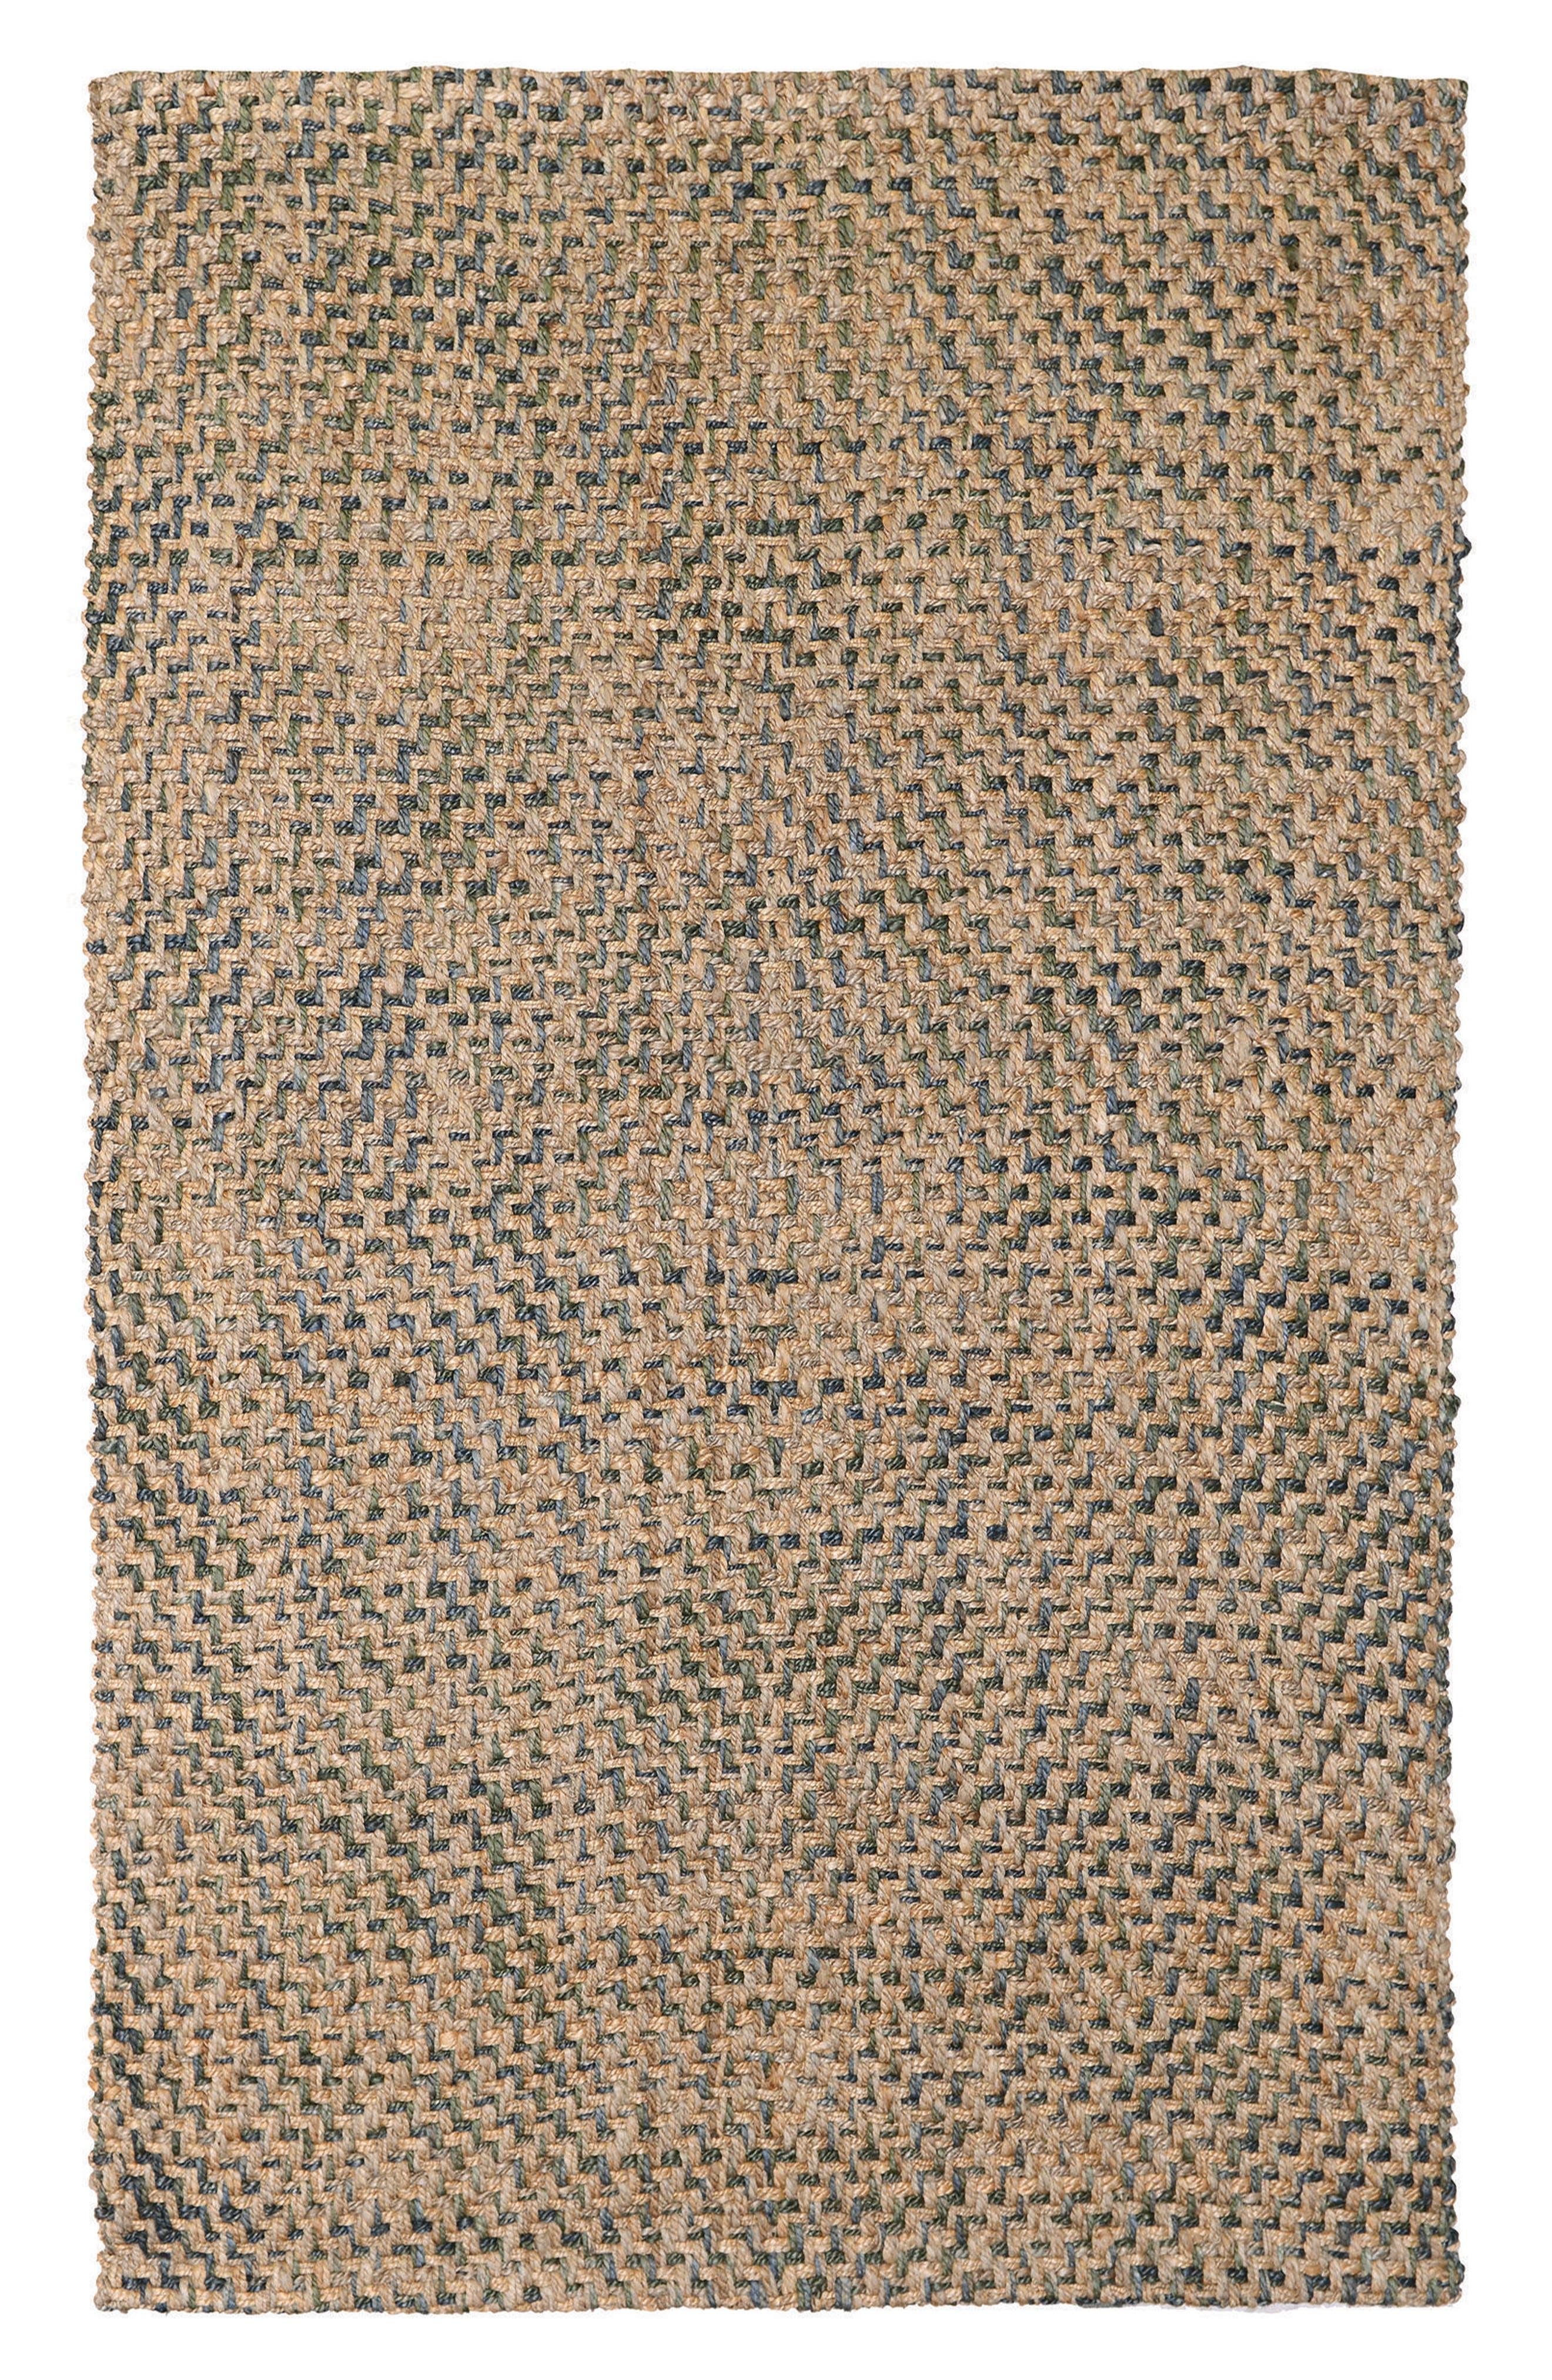 Ladera Handwoven Rug,                         Main,                         color, 250